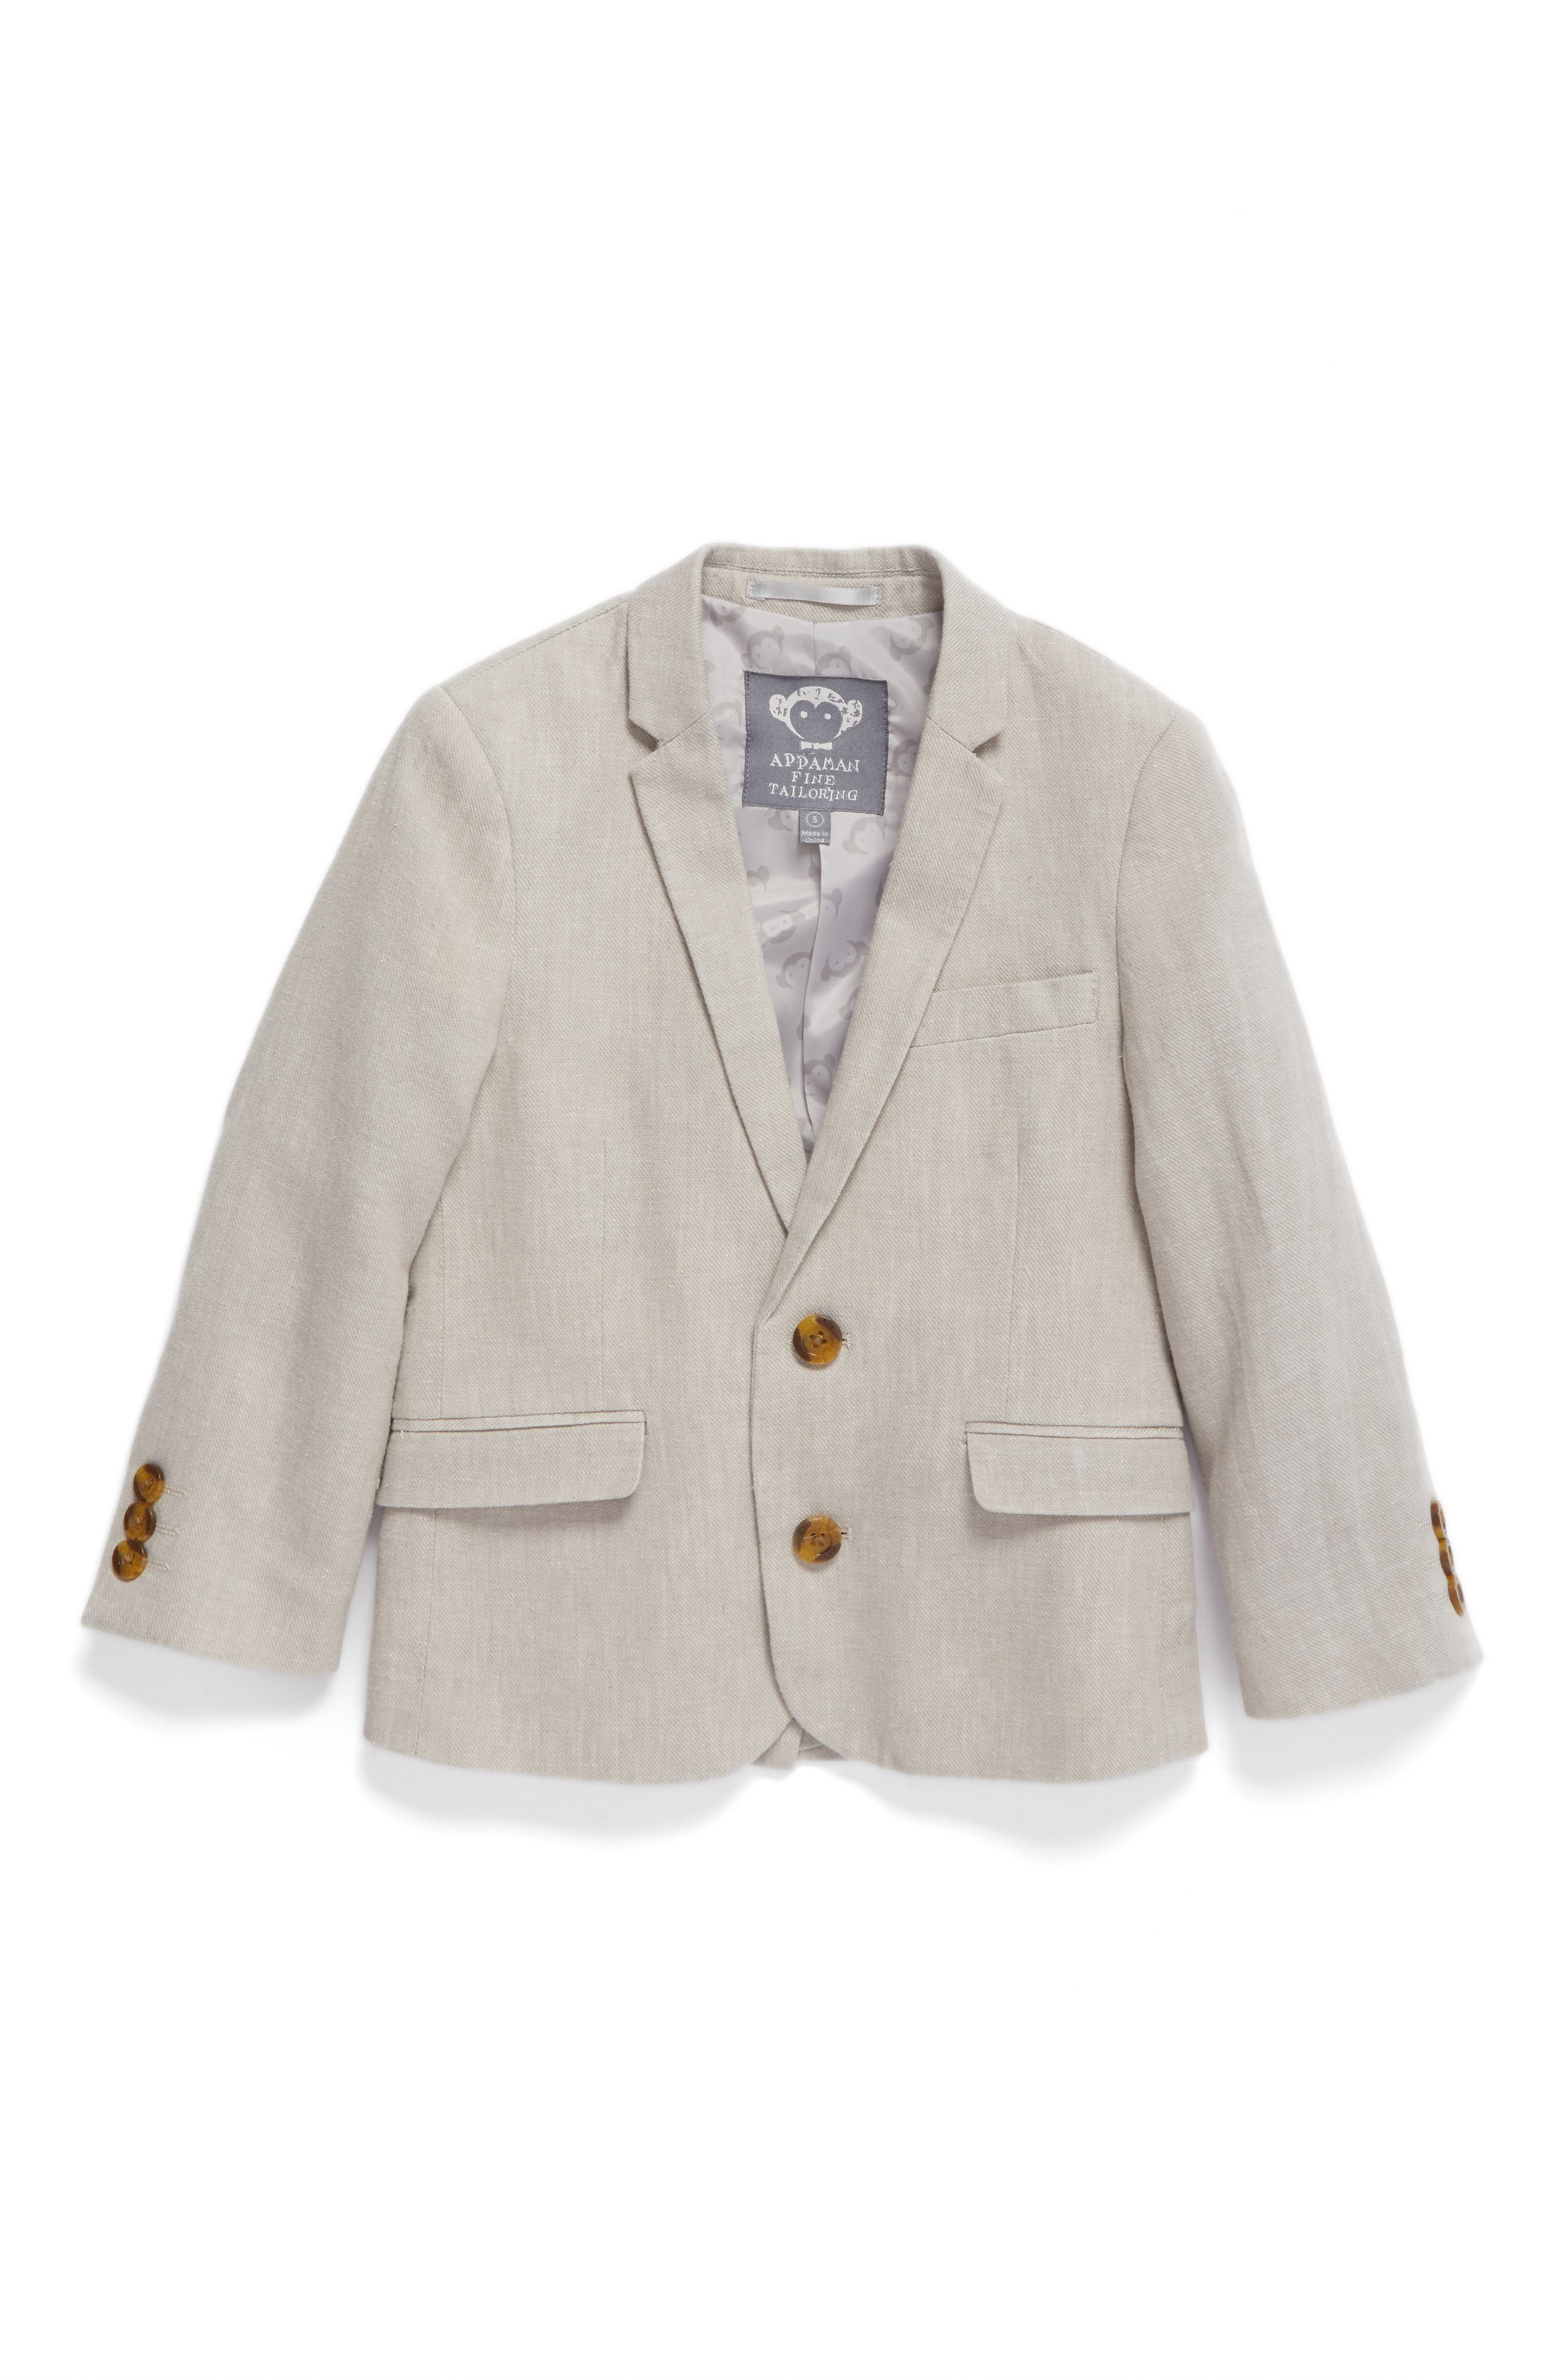 Alternate Image 1 Selected - Appaman Linen Suit Jacket (Toddler Boys, Little Boys & Big Boys)